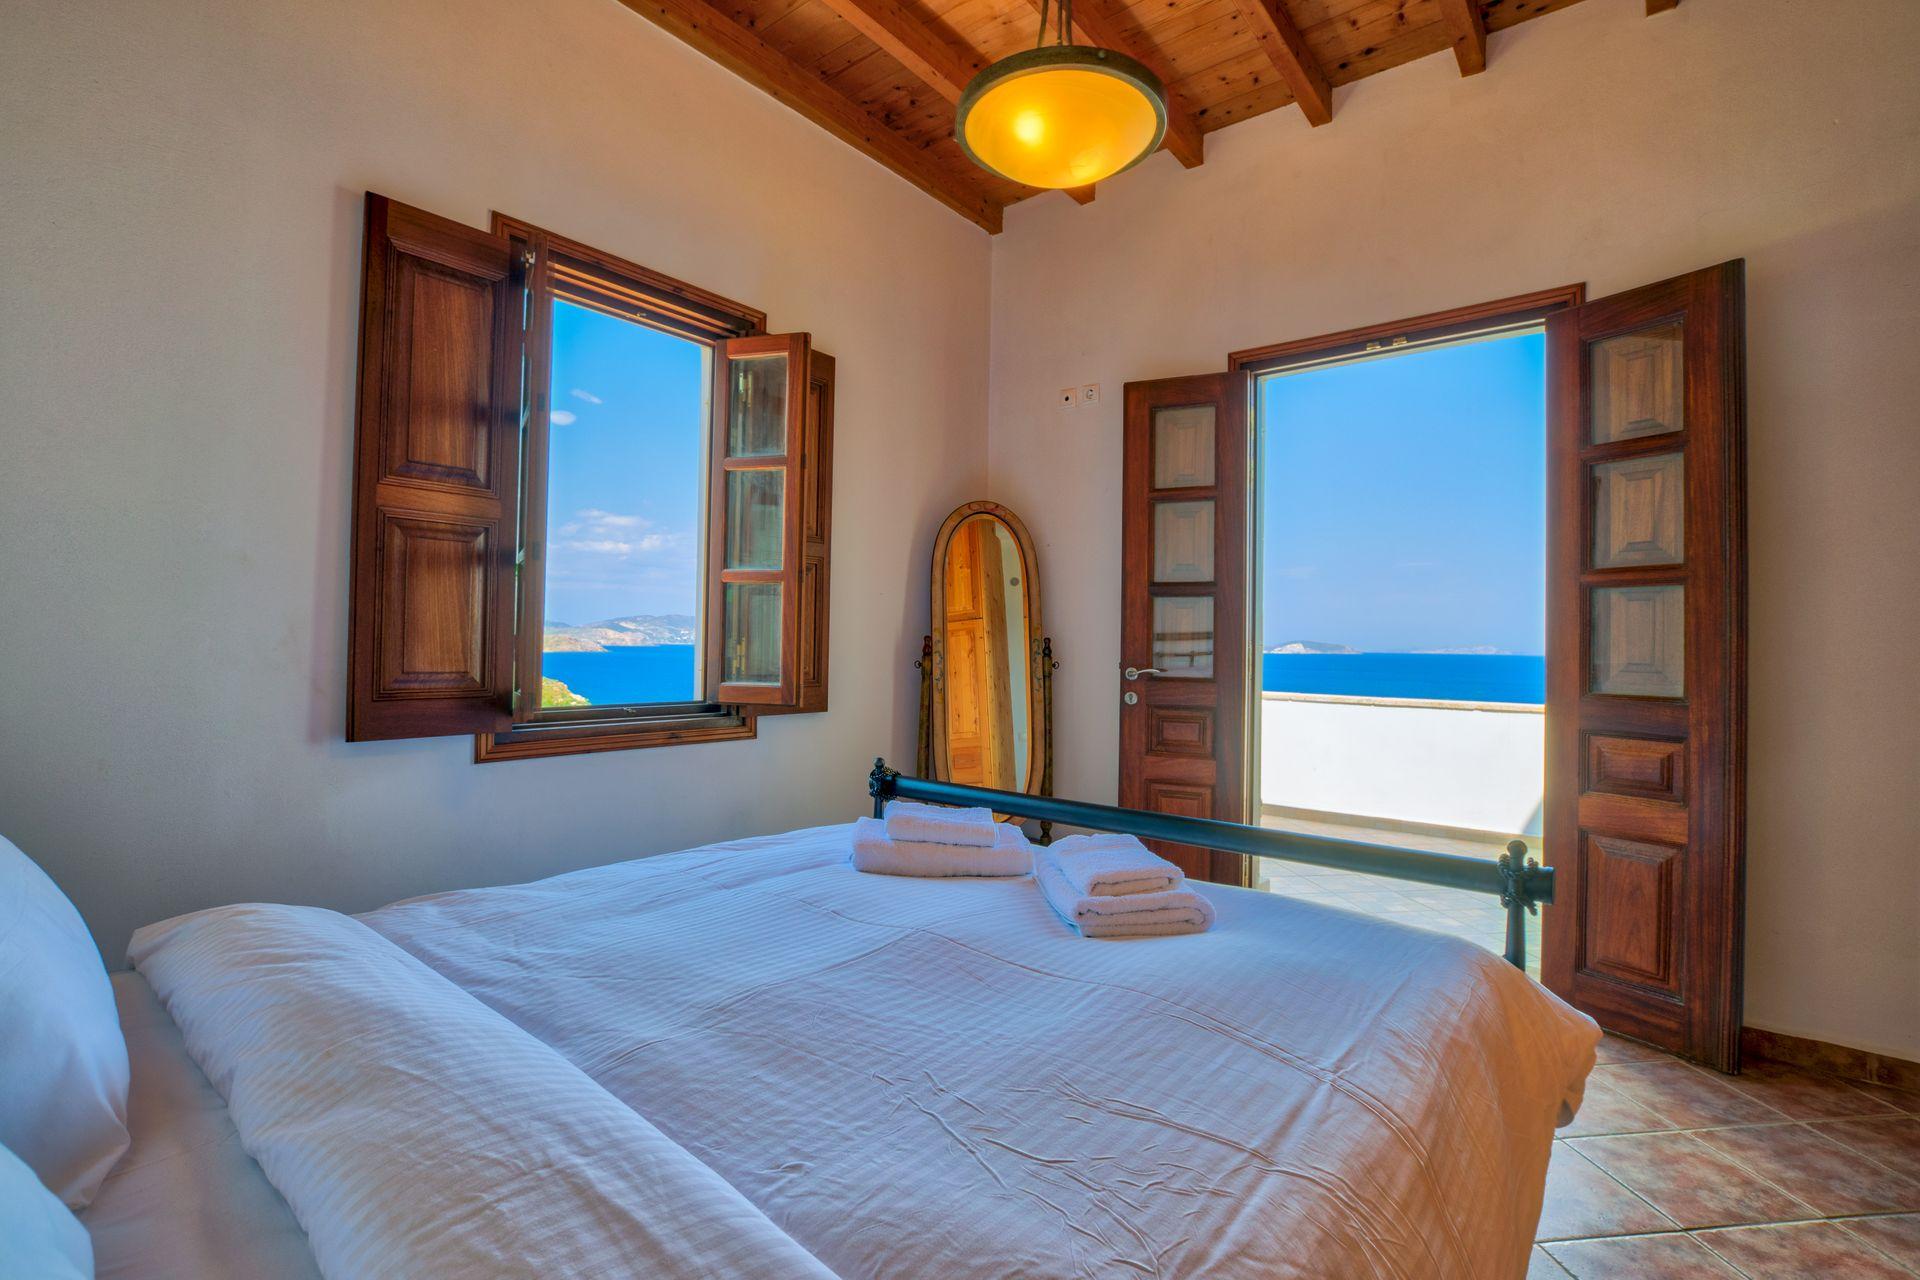 Allotina Houses - Πάτμος ✦ 2 Ημέρες (1 Διανυκτέρευση) ✦ 2 άτομα ✦ Χωρίς Πρωινό ✦ 01/07/2021 έως 31/08/2021 ✦ 2 λεπτά με τα πόδια από την παραλία!